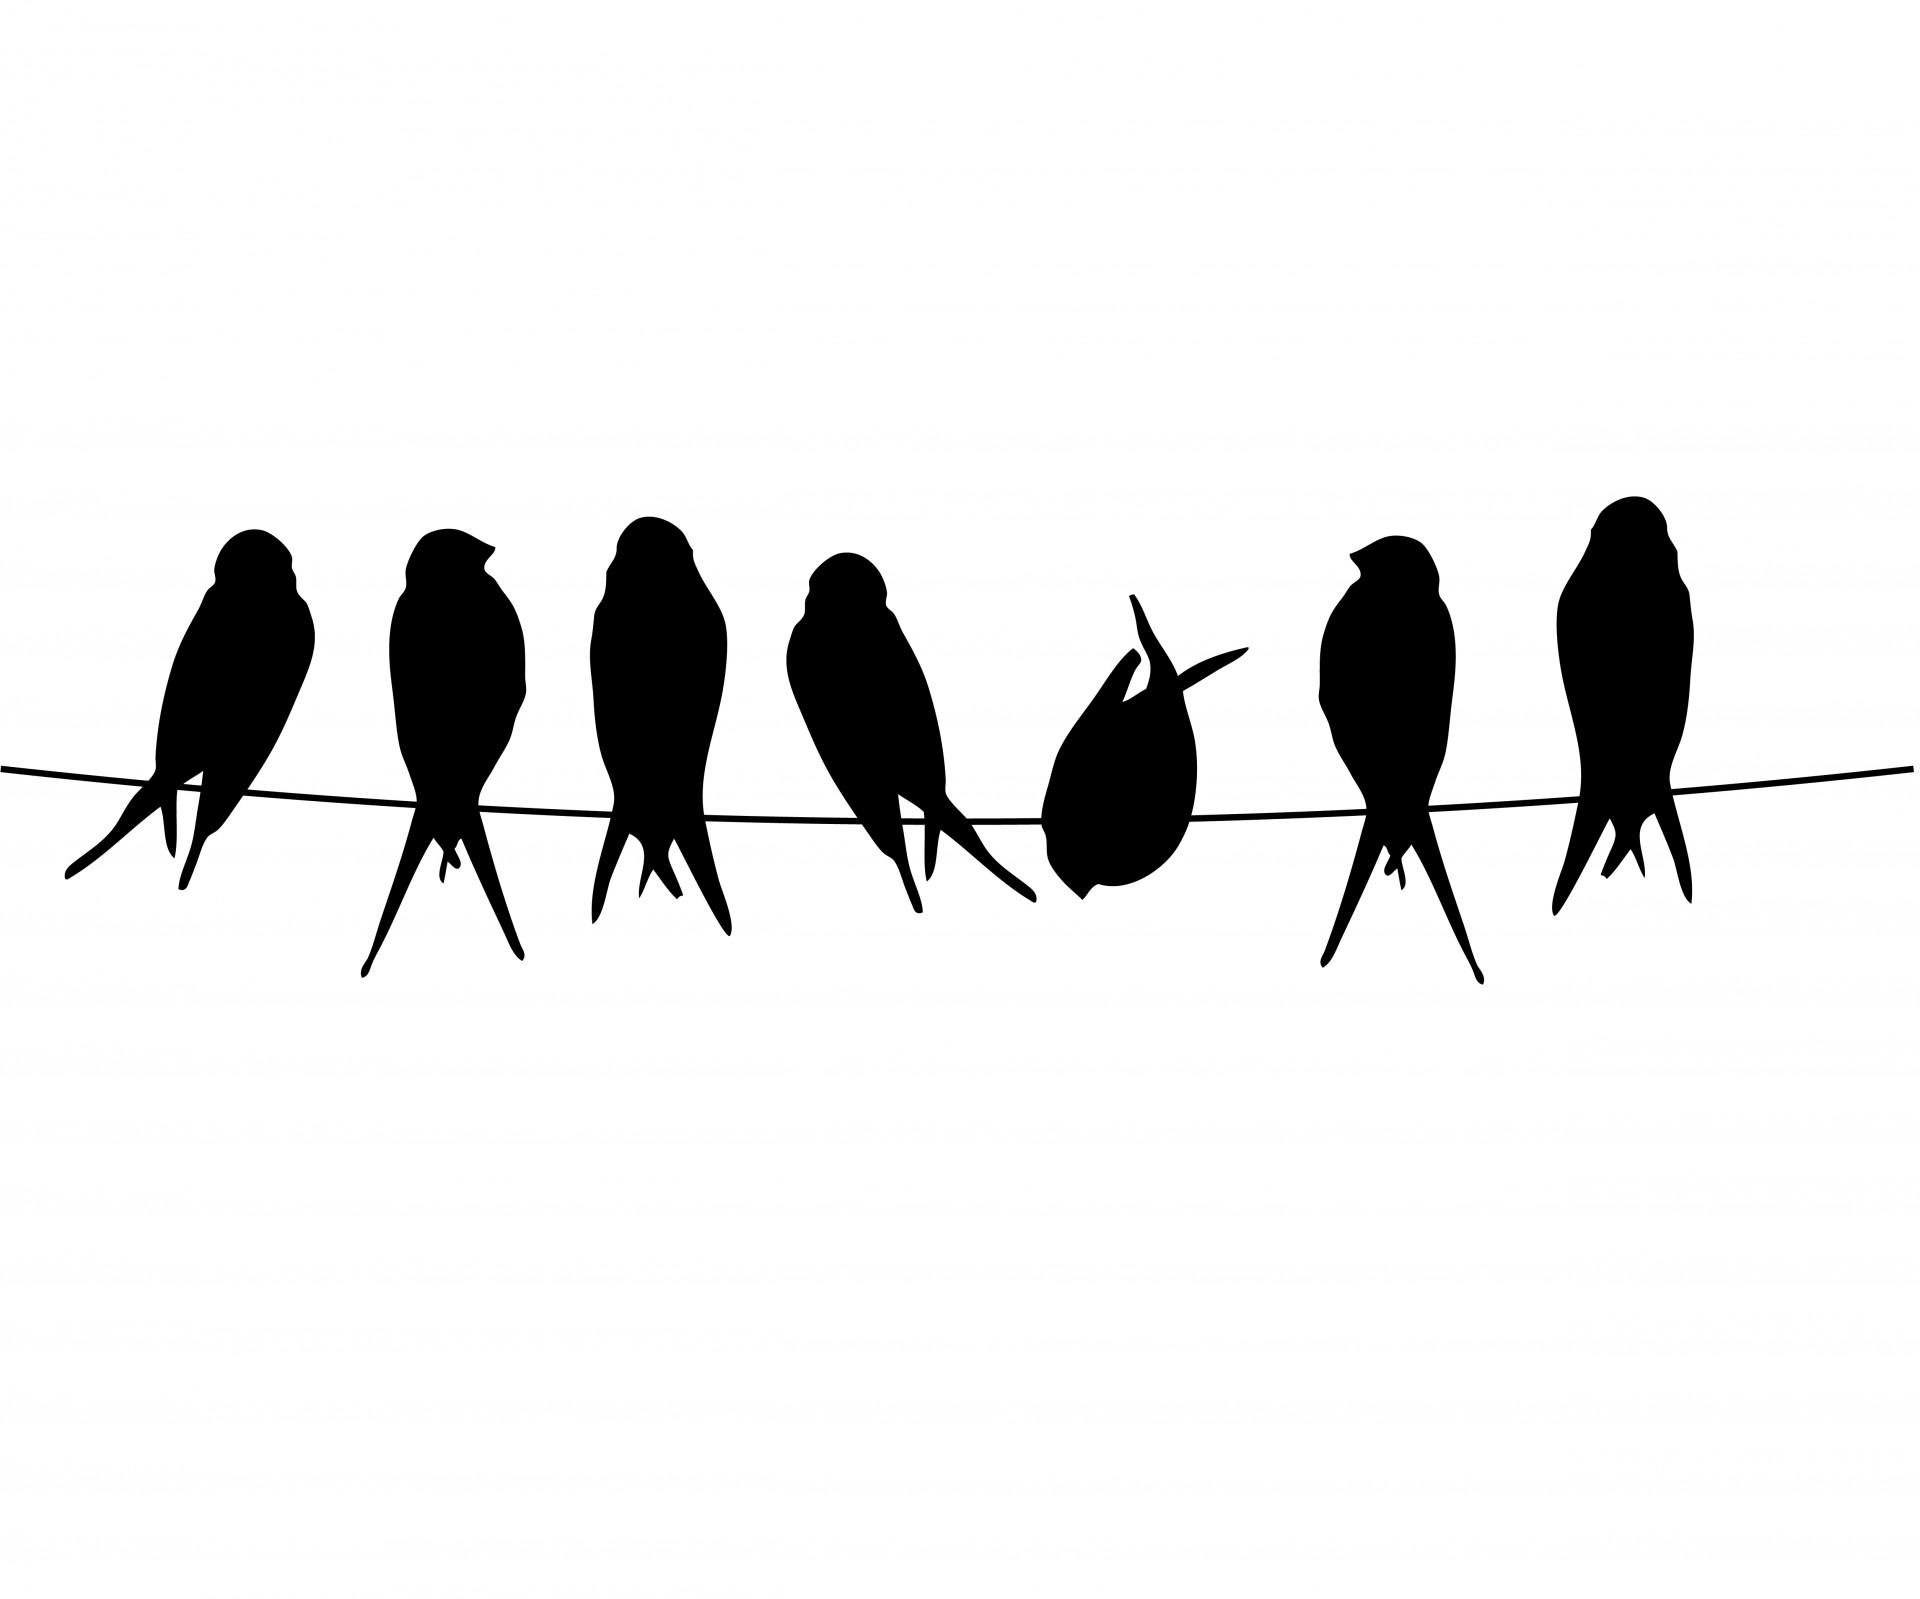 1920x1599 Birds On A Wire Free Stock Photo